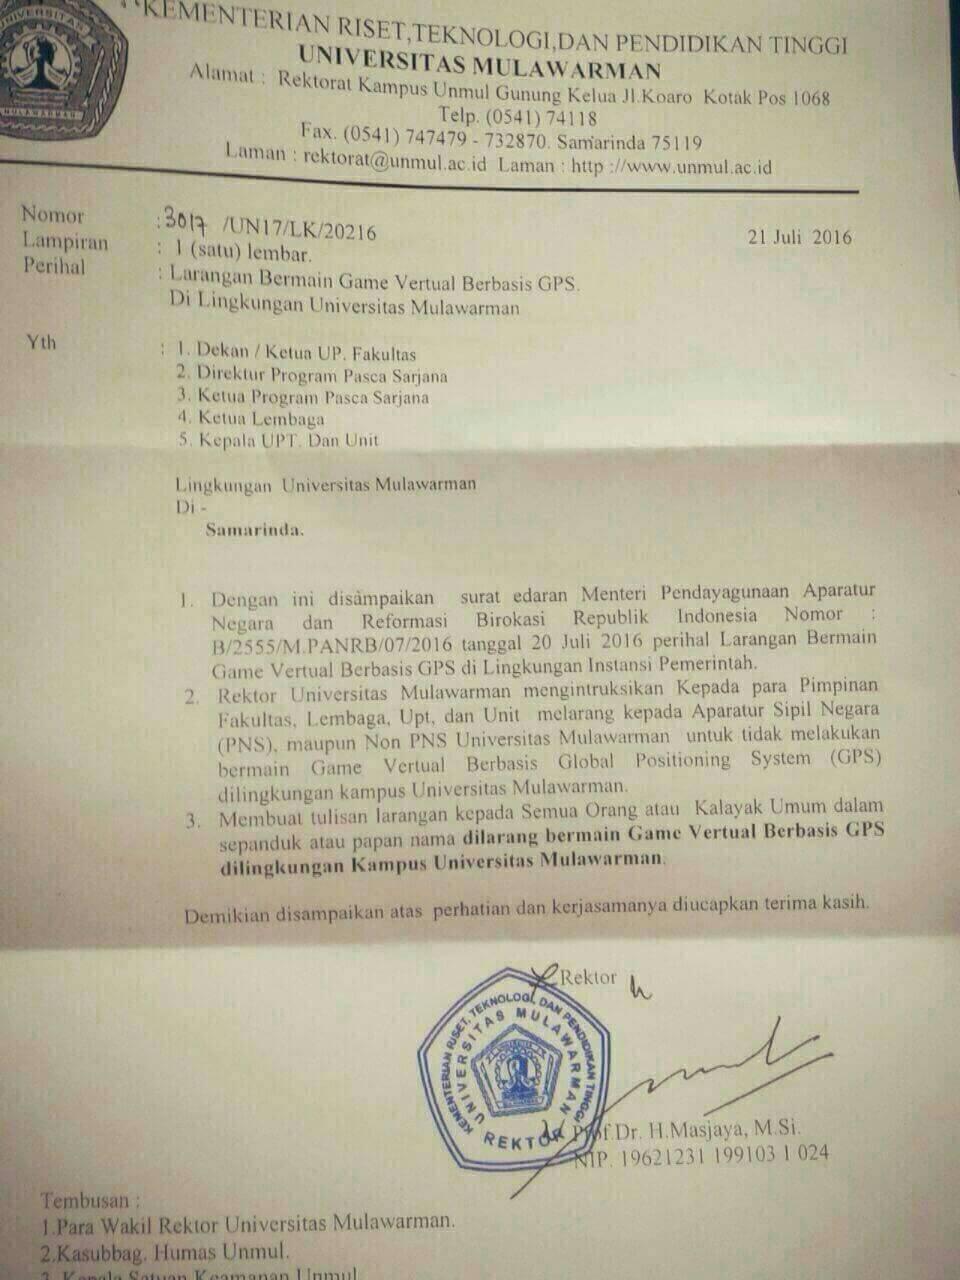 Surat Edaran Rektor Universitas Mulawarman